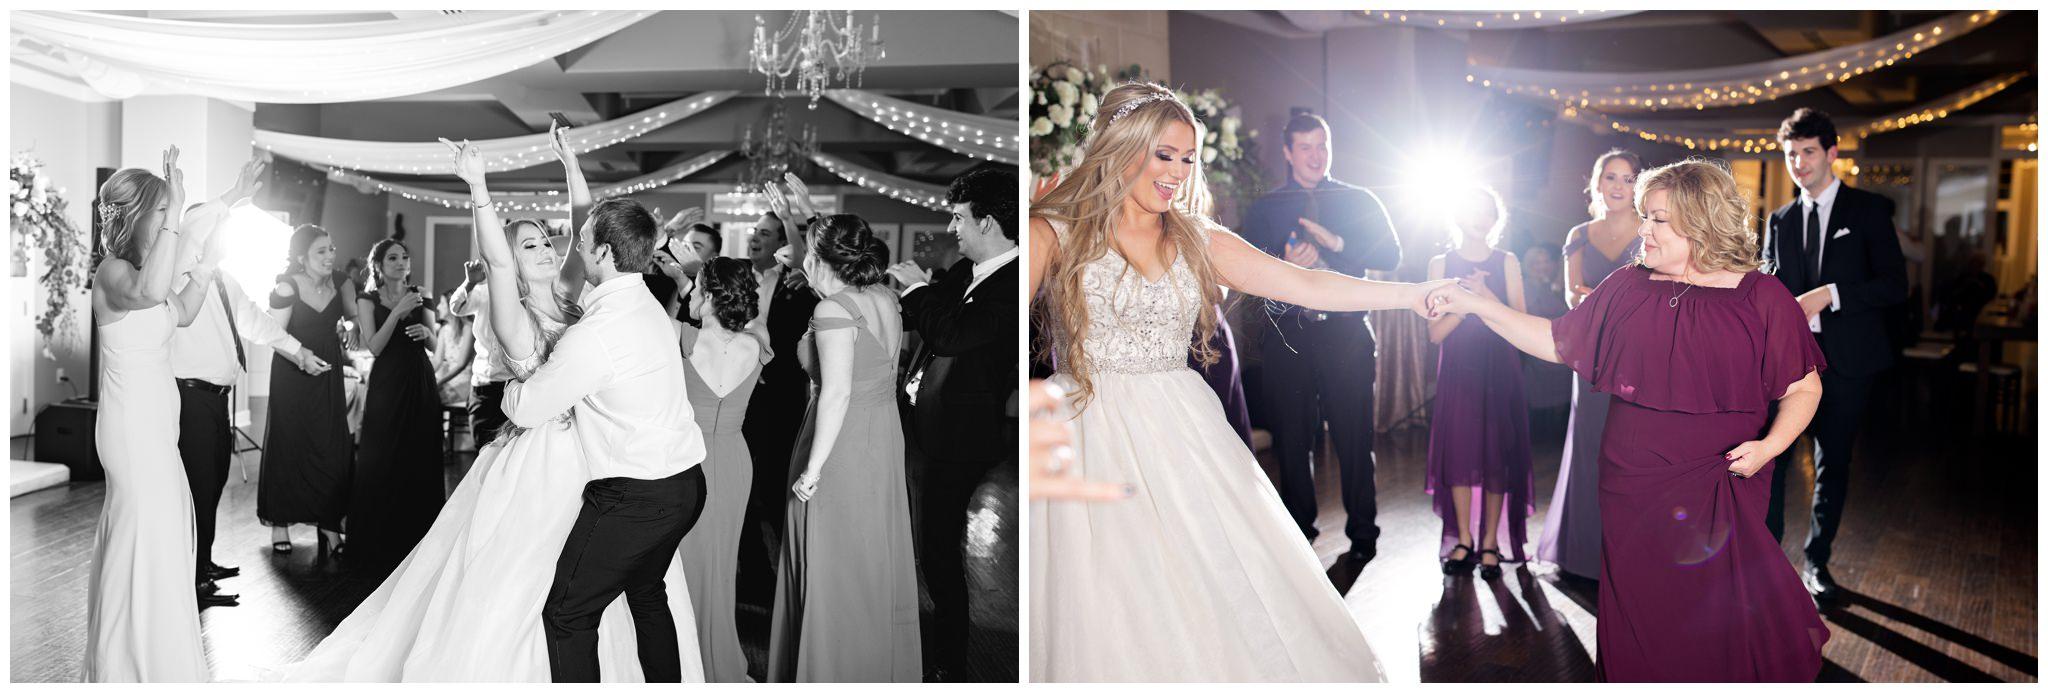 Wedding guest dancing with bride and groom at Utah wedding